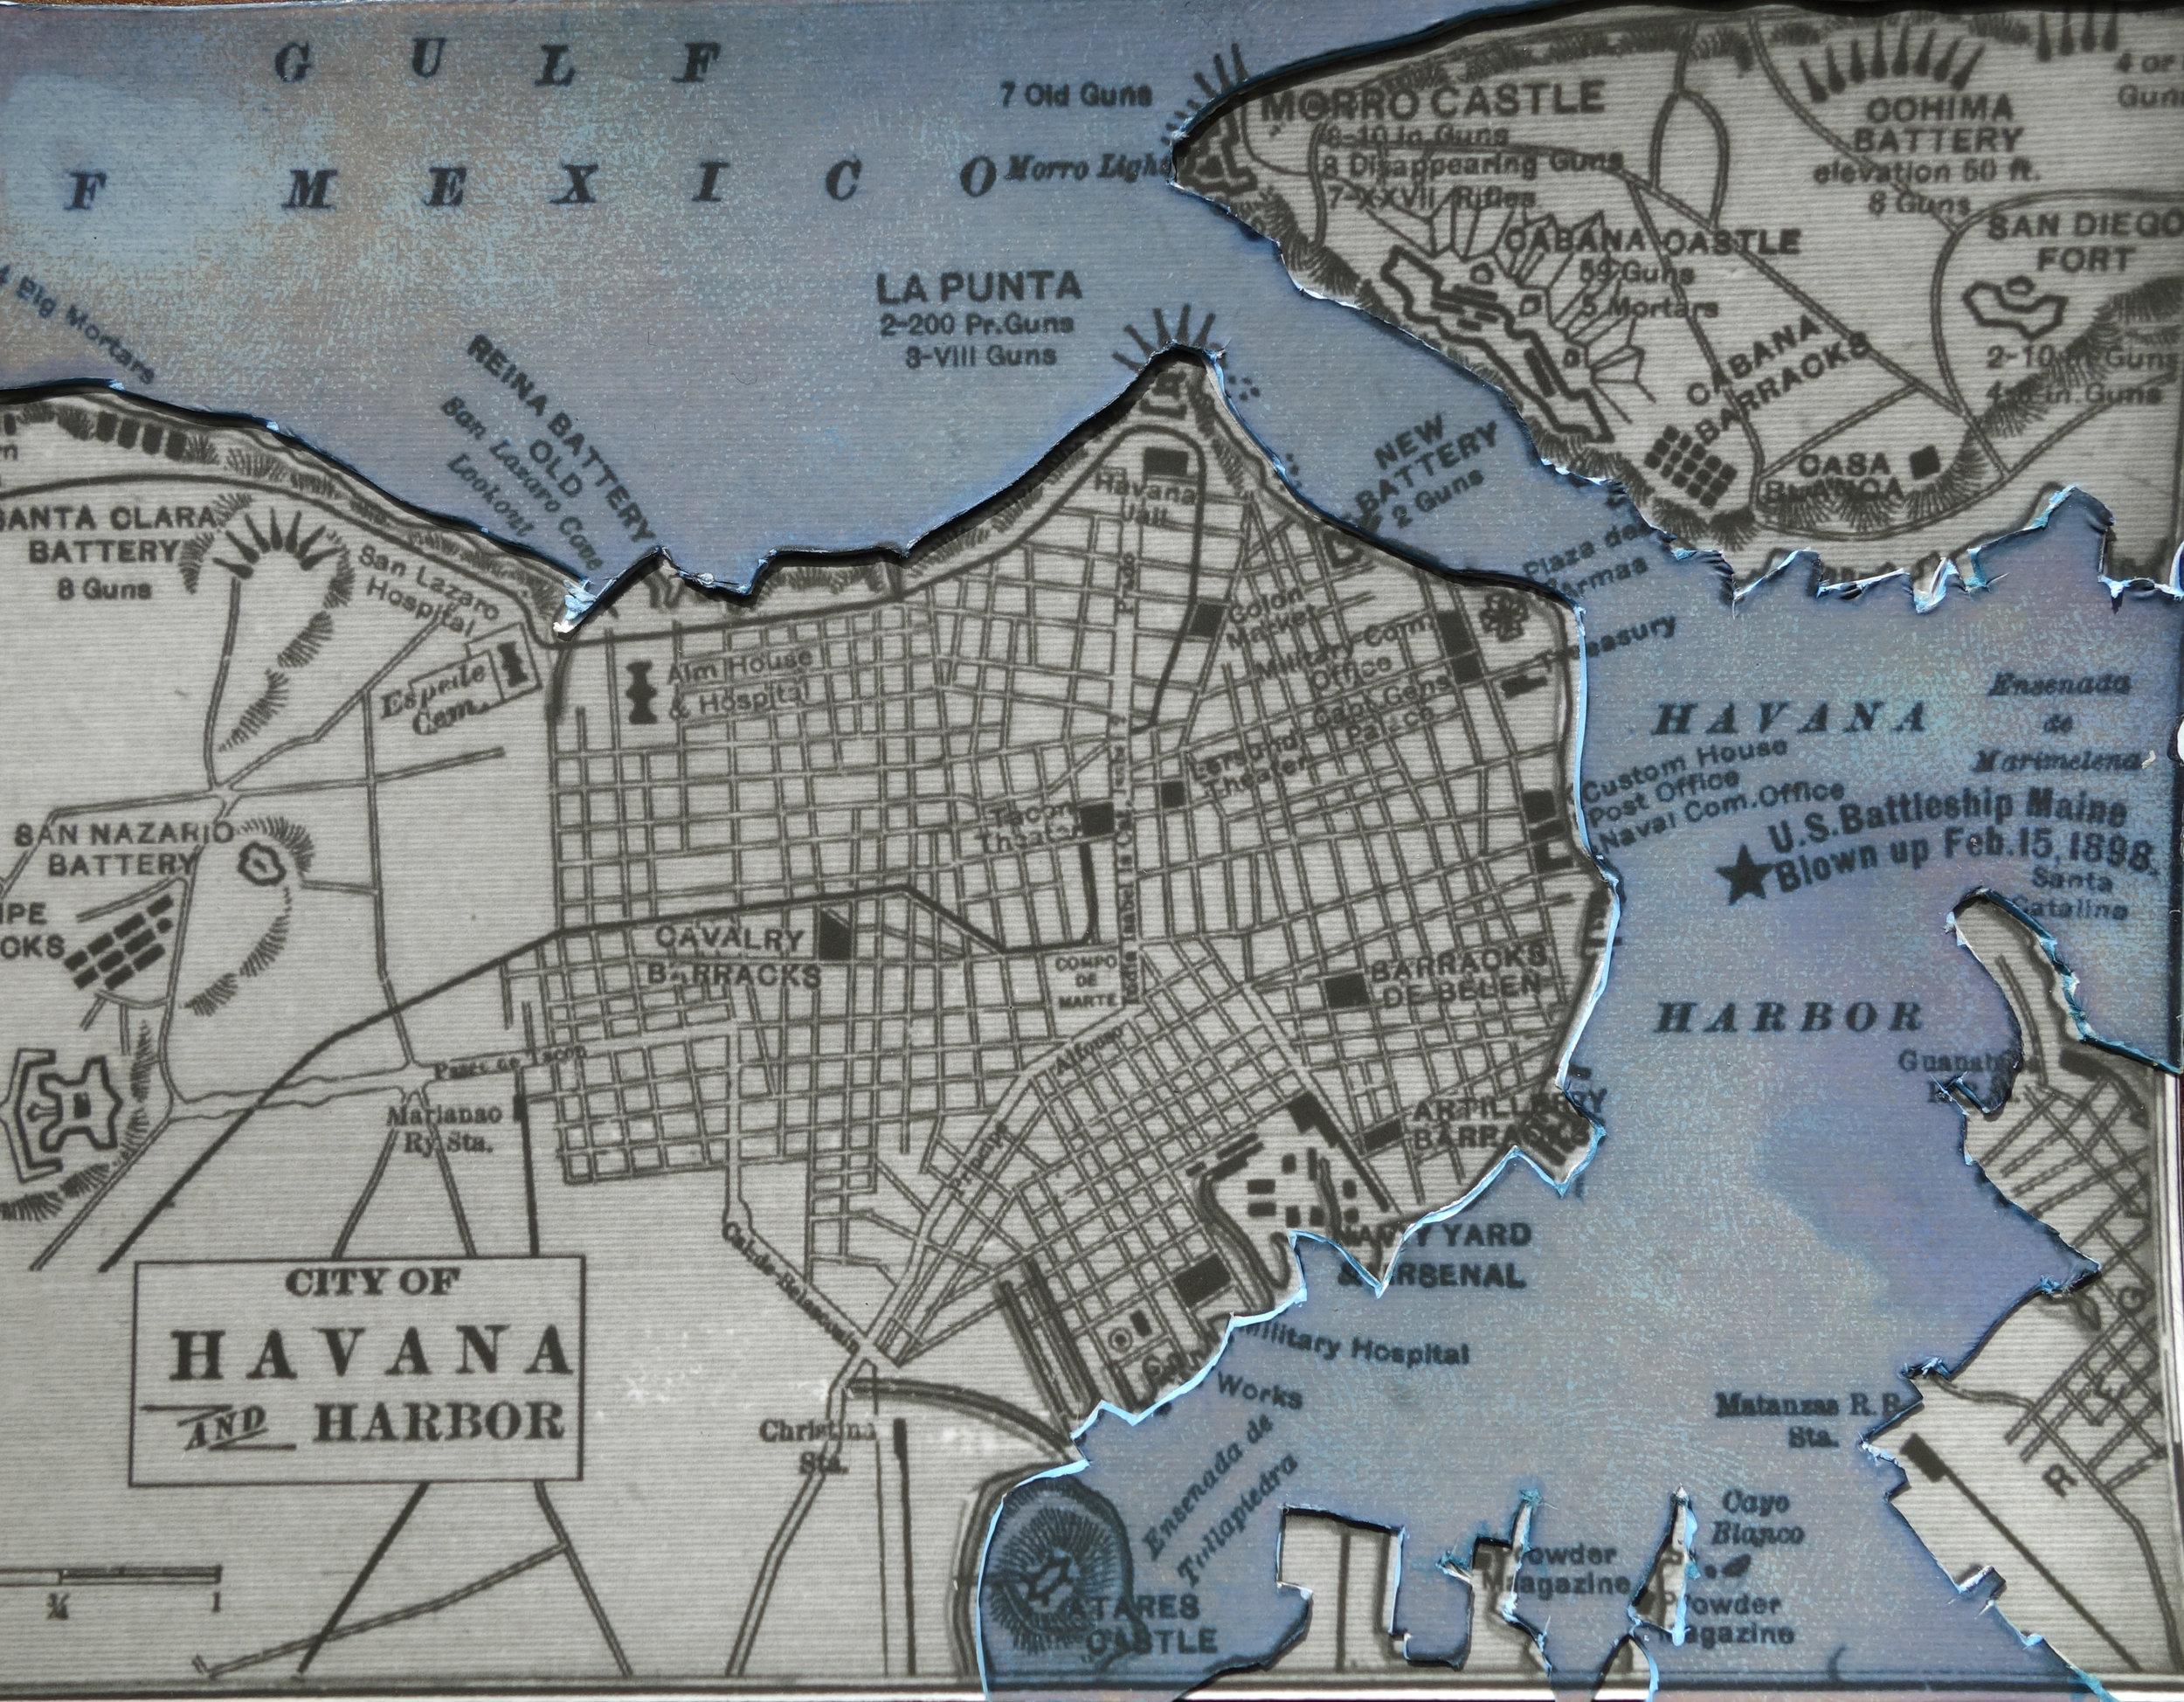 Havana #1